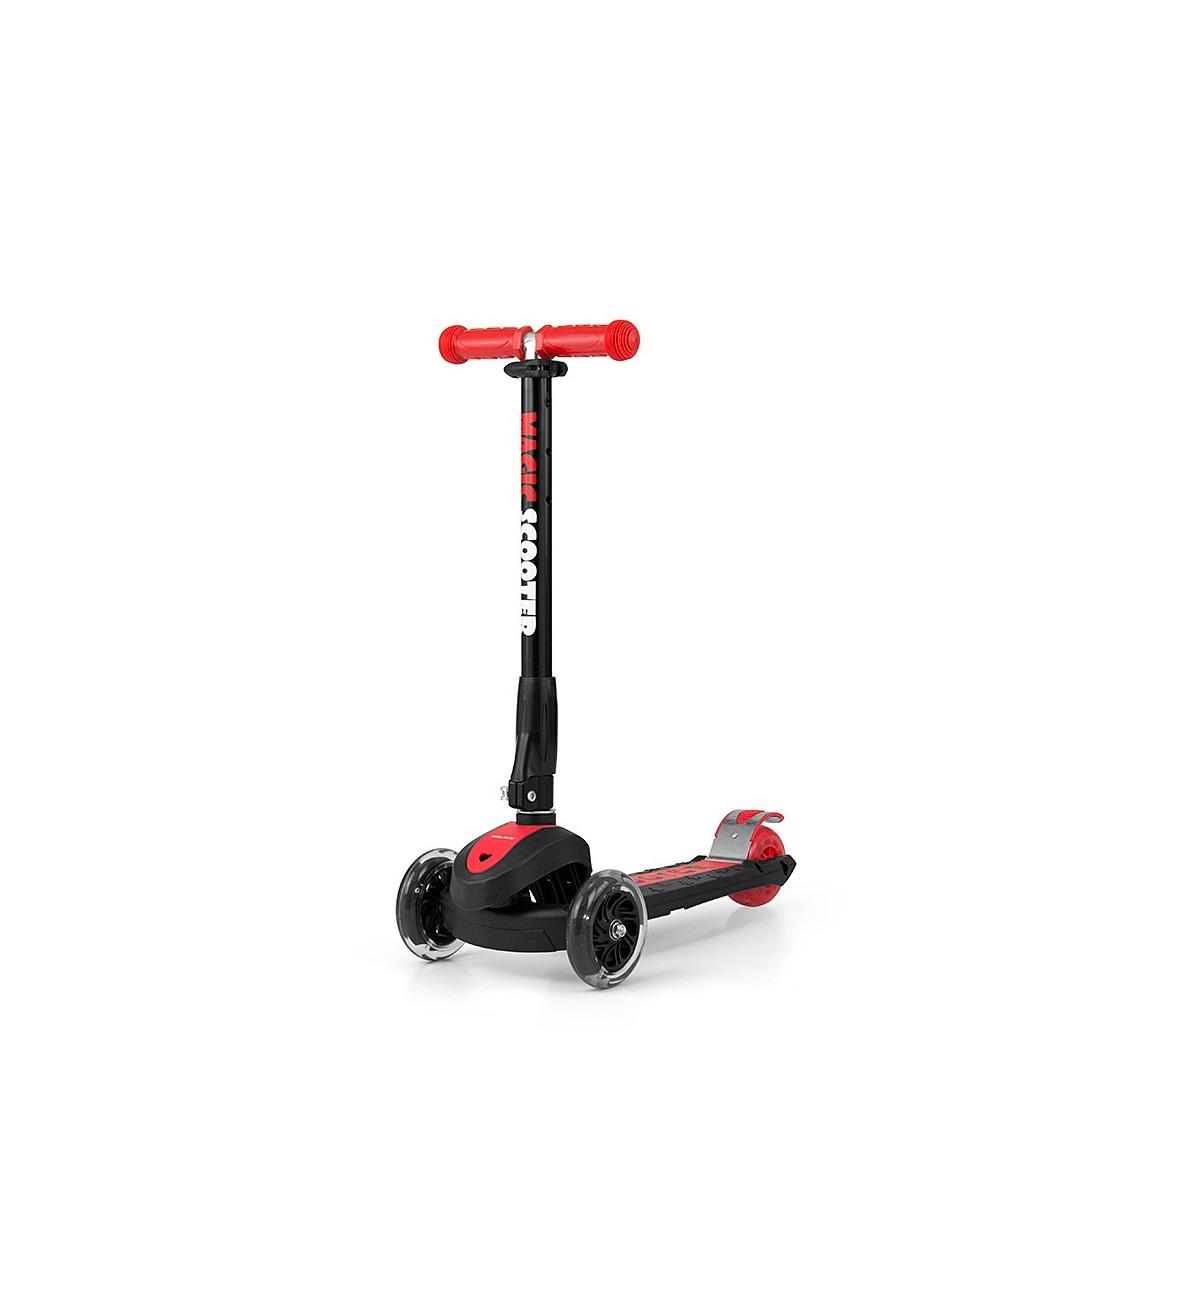 Hulajnoga Scooter Magic Red